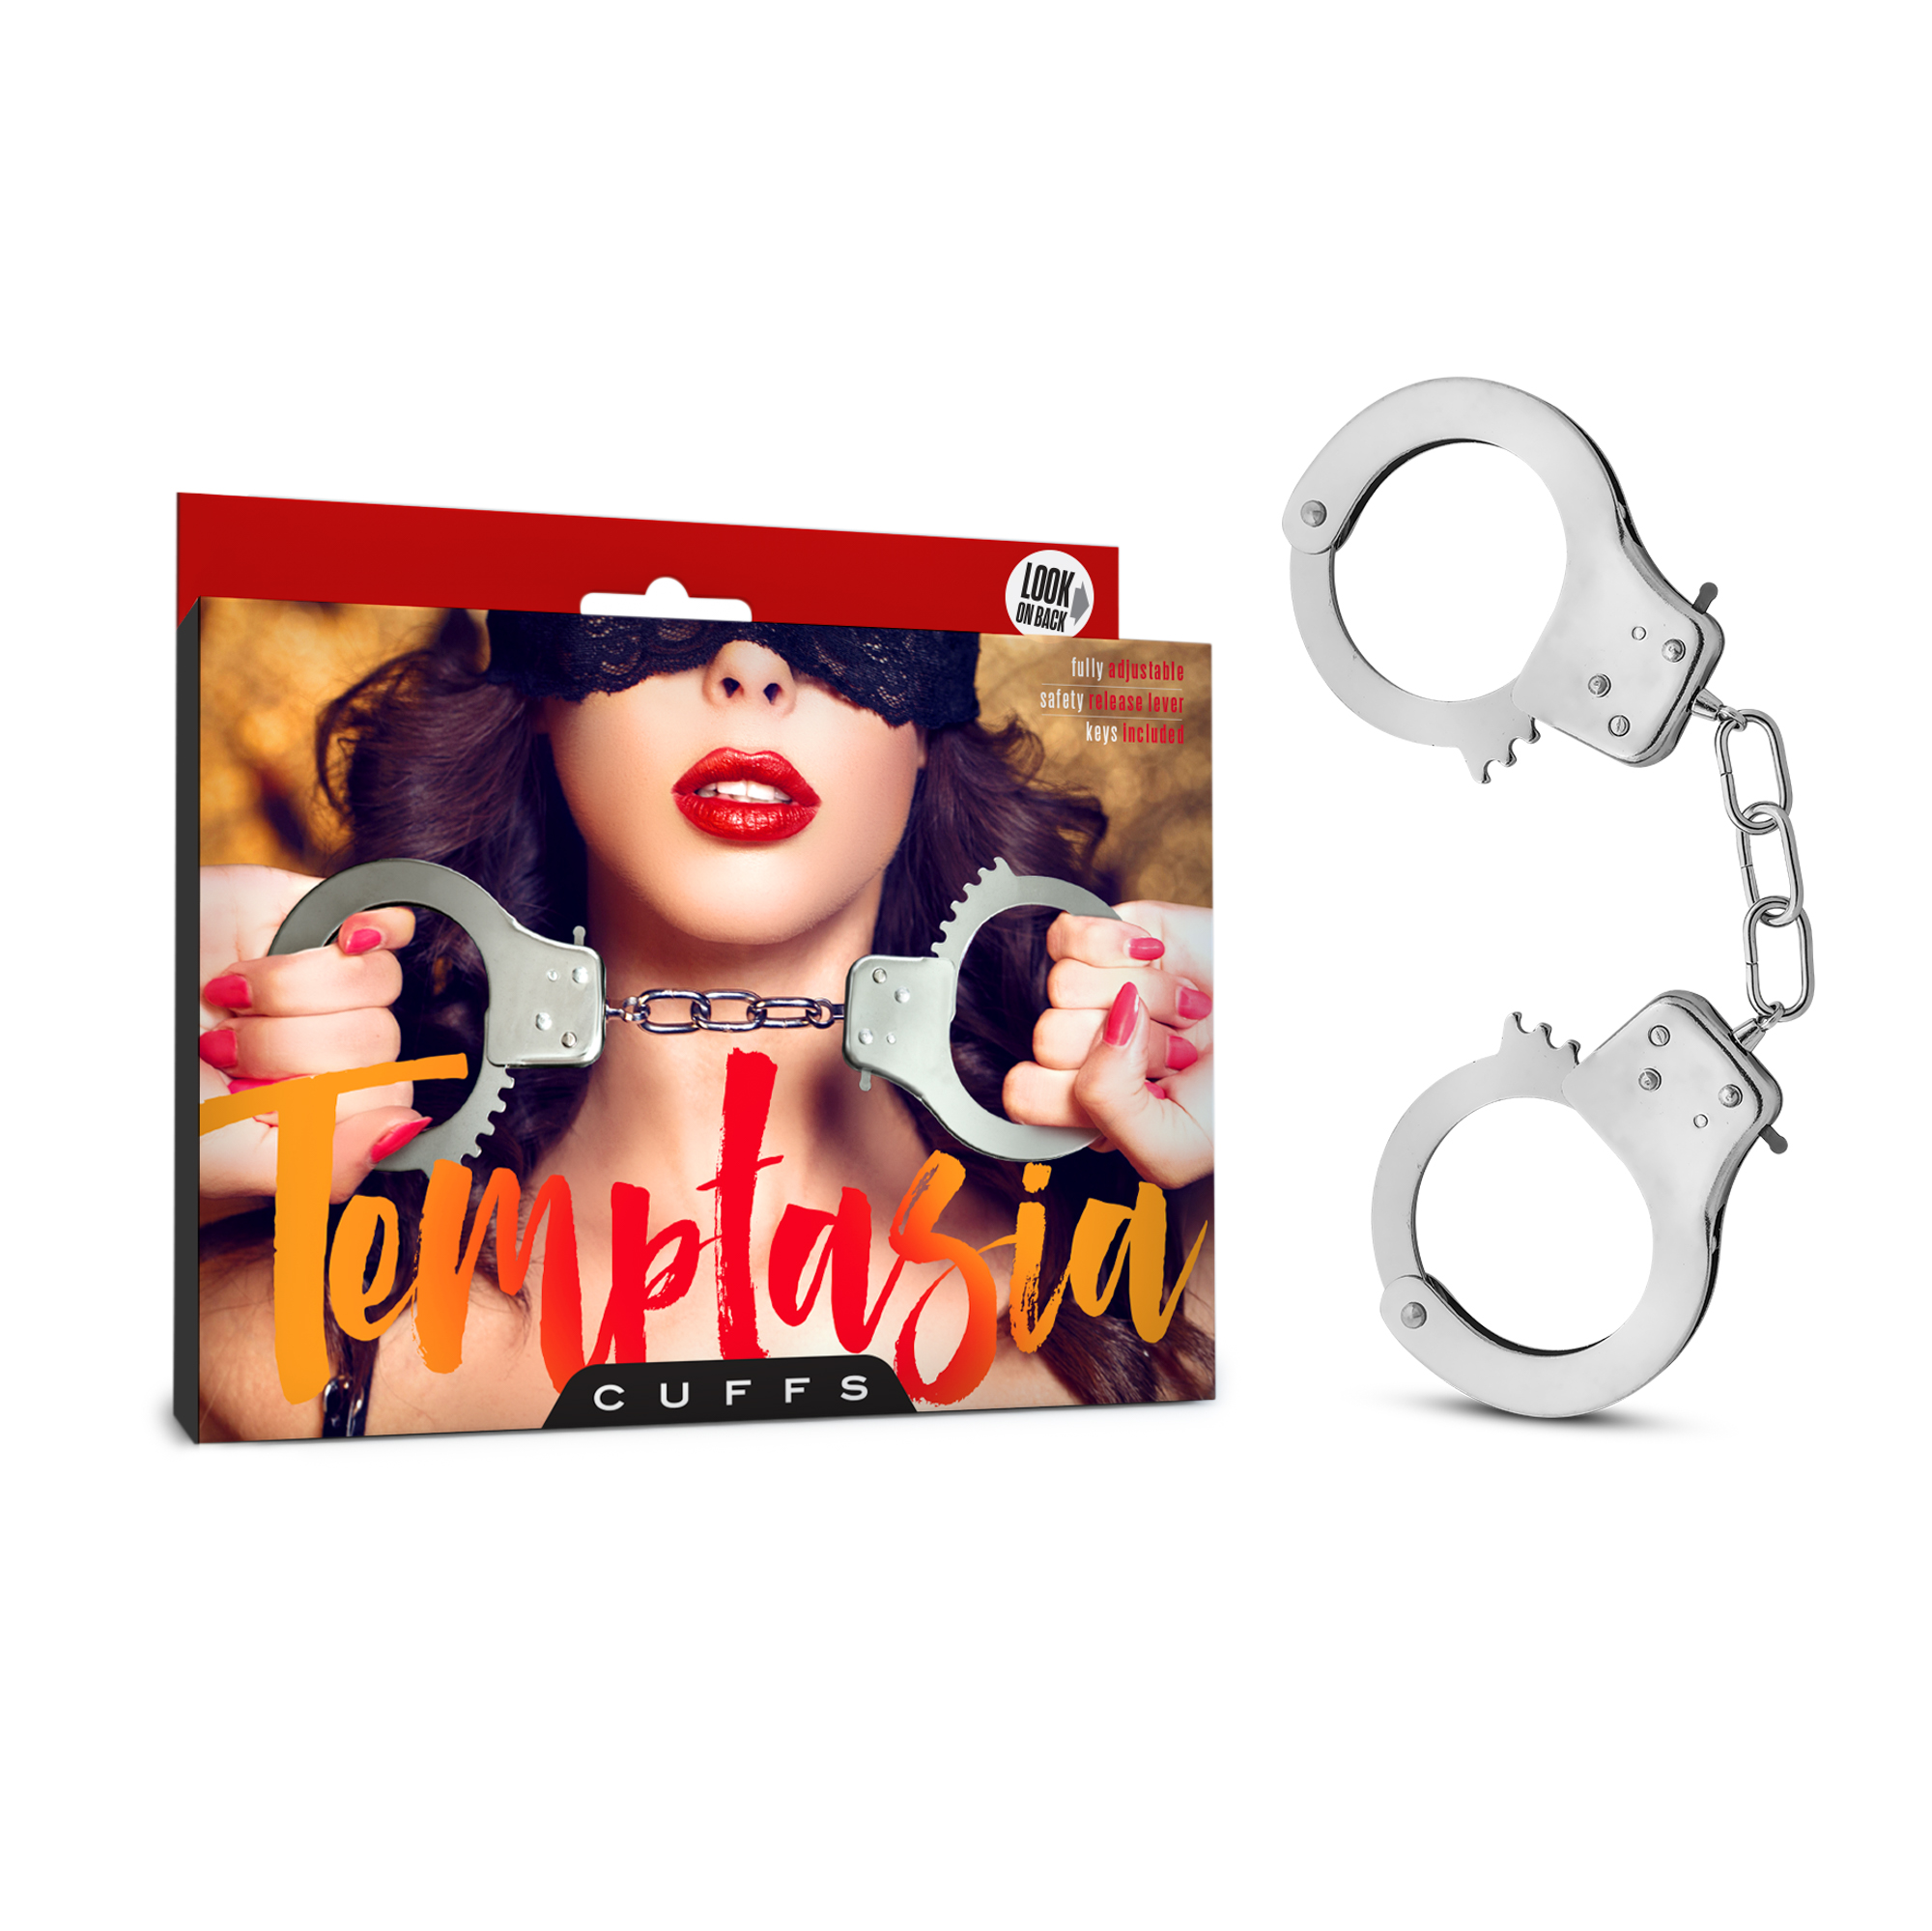 Temptasia - Cuffs - Silver